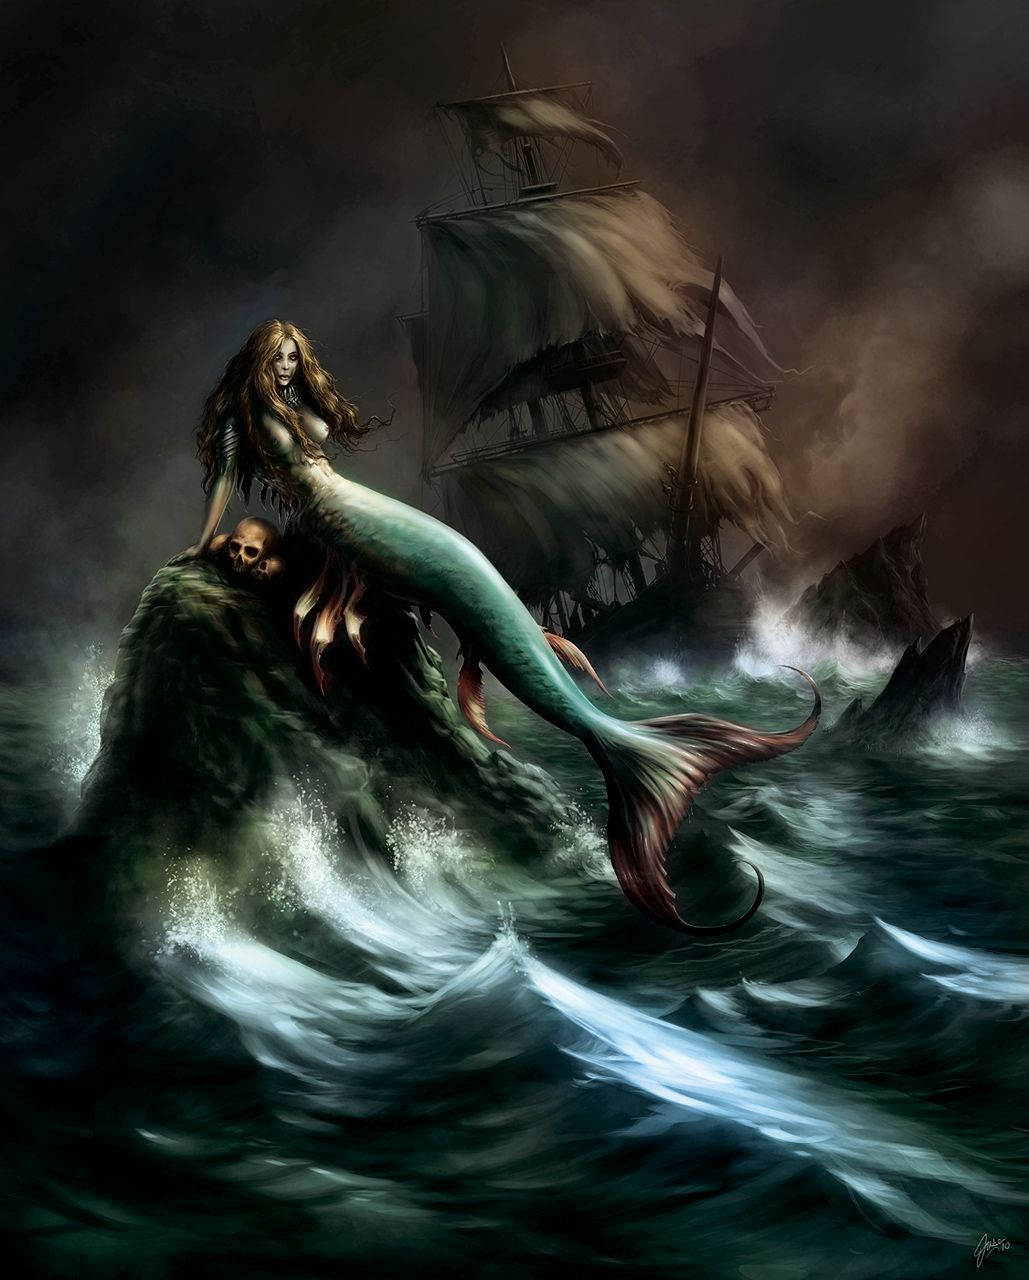 dark art wallpaper mermaids